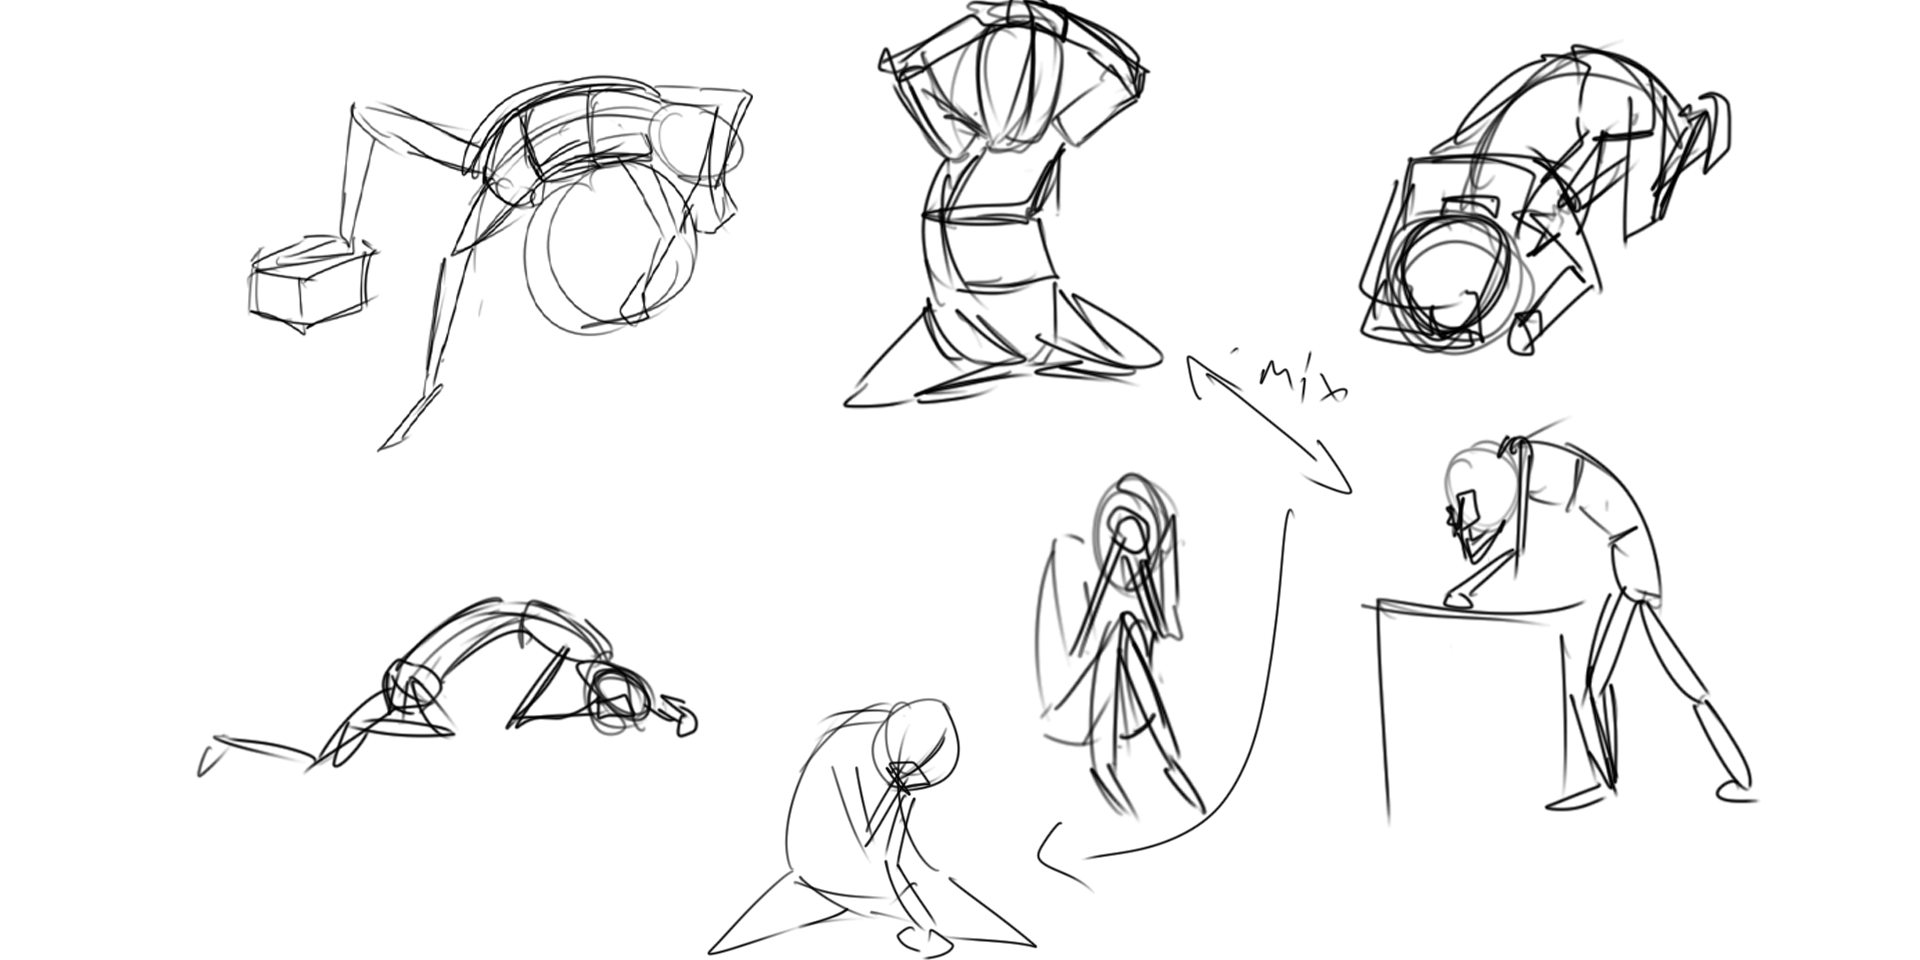 Devastation Sketches